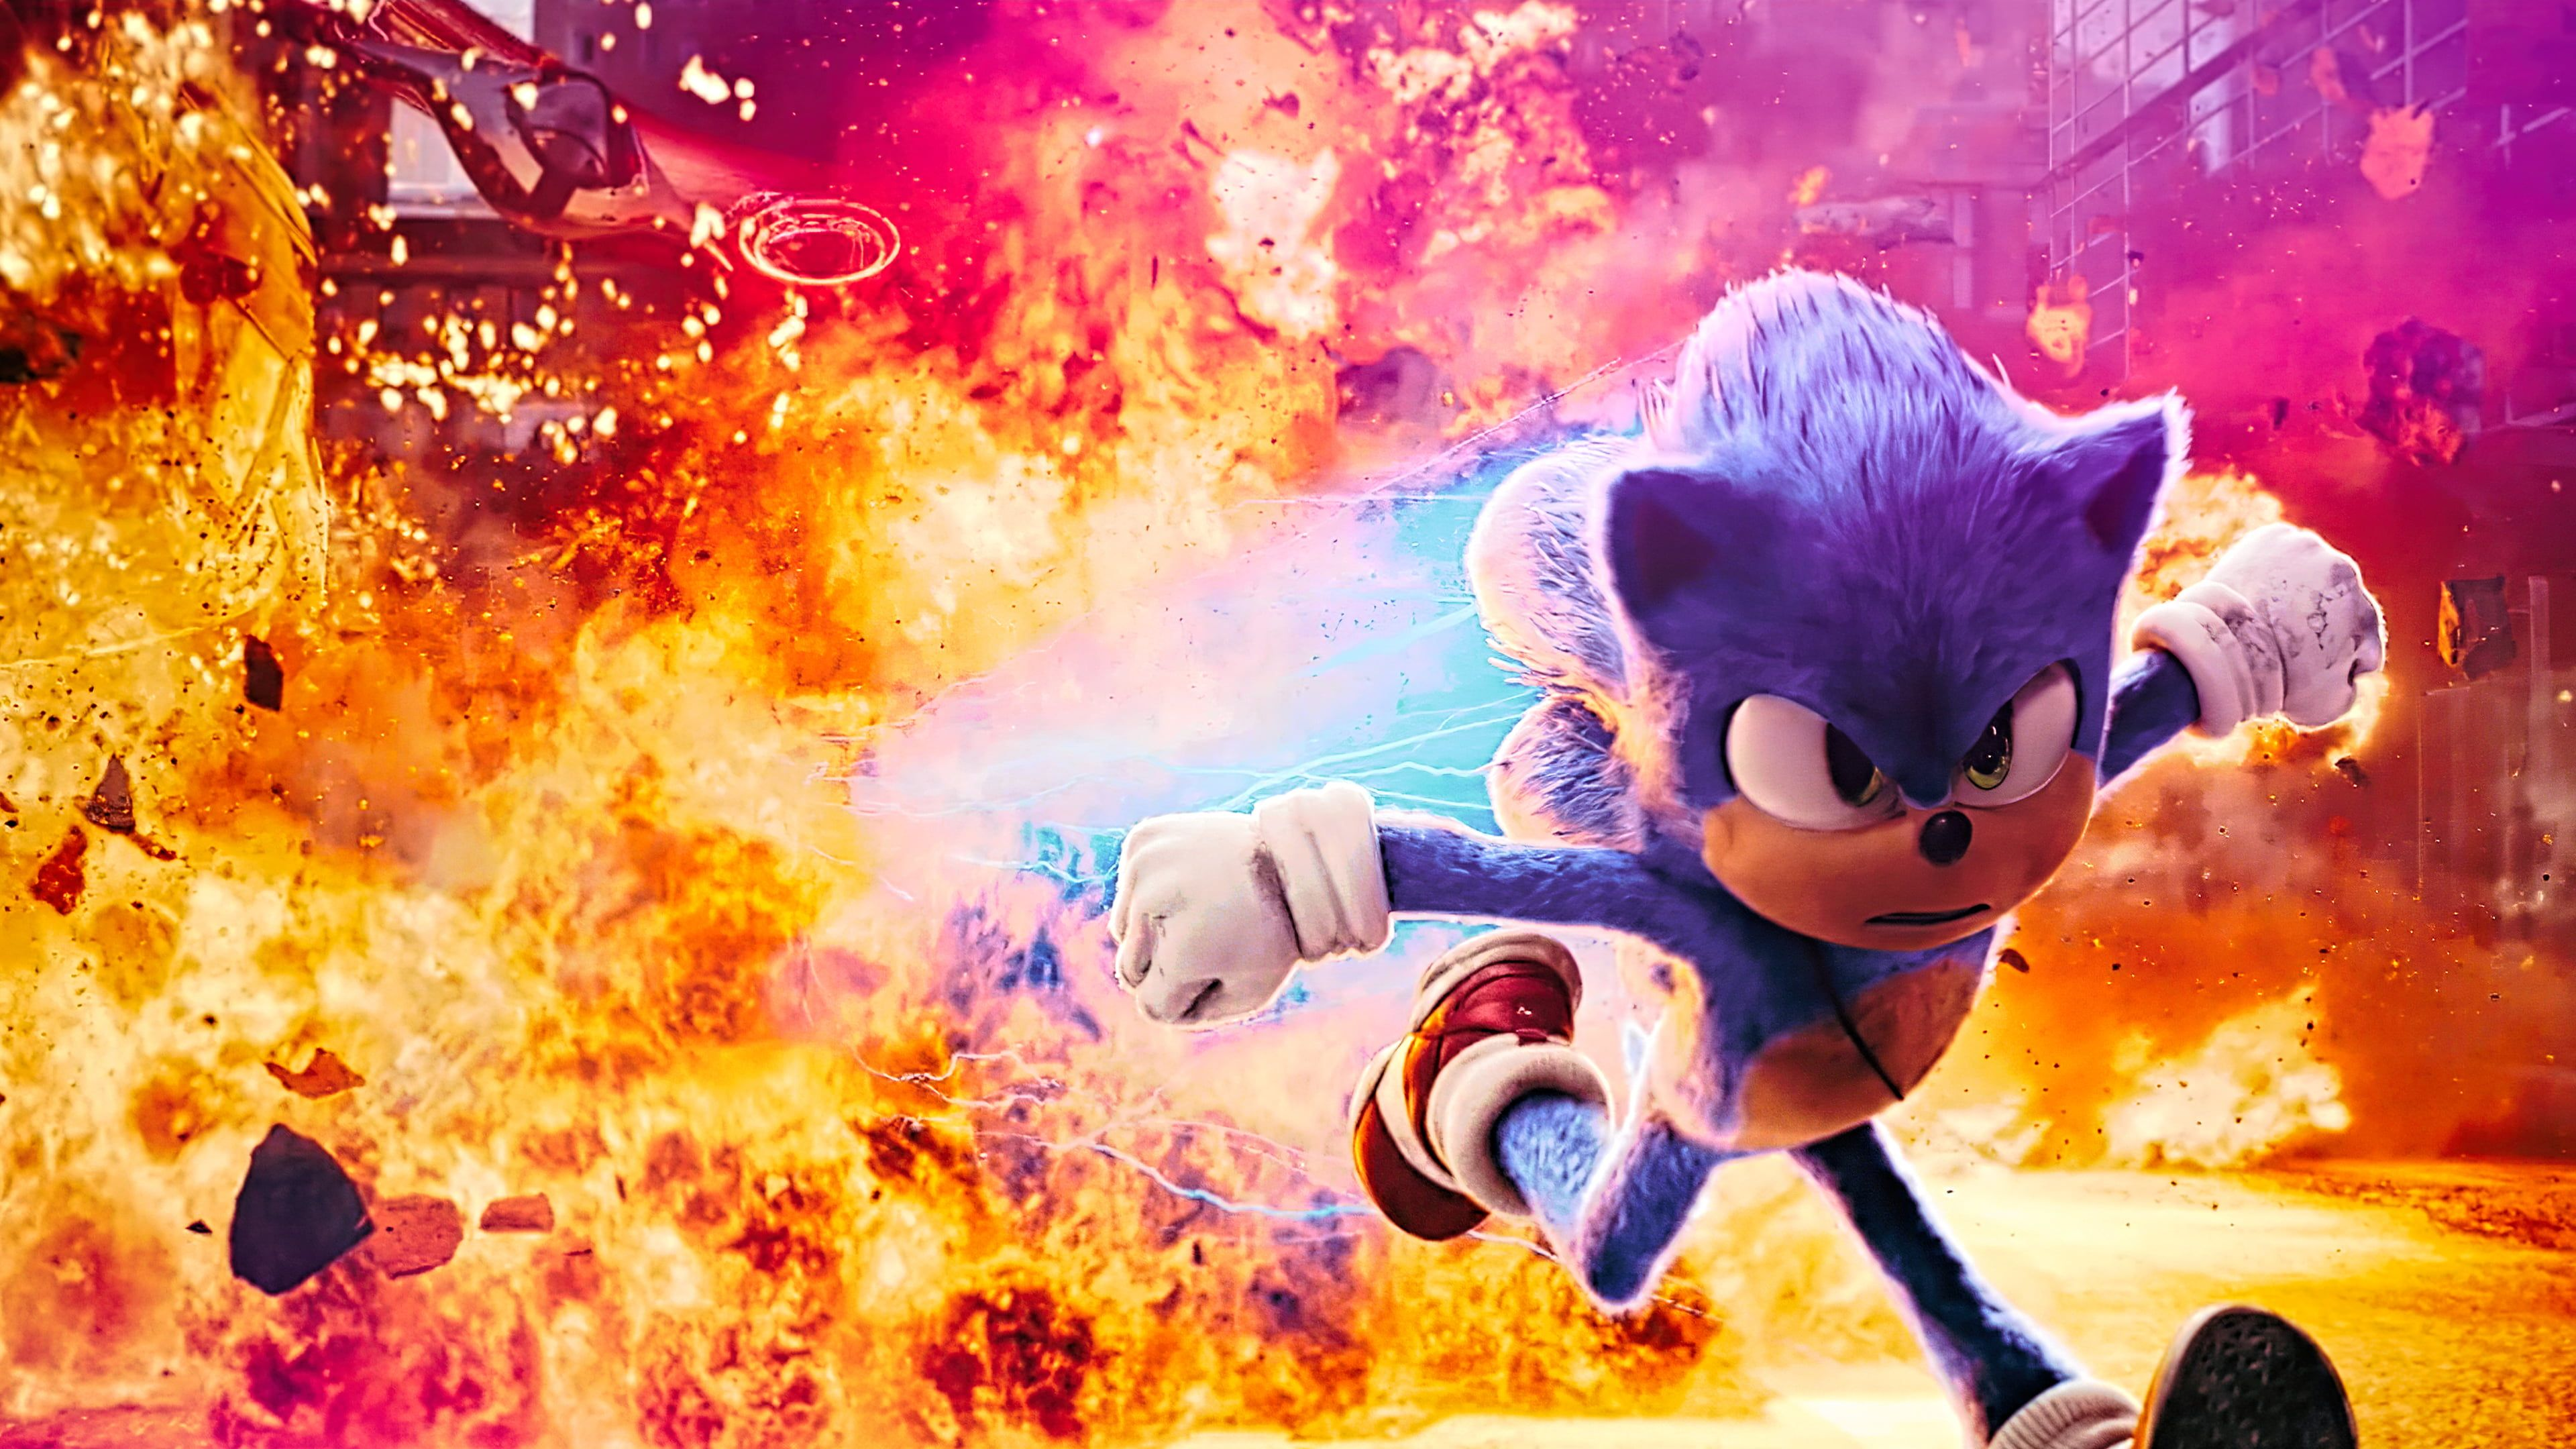 Sonic The Hedgehog Sonic 2020 Cgi 3d Graphics 4k Wallpaper Hdwallpaper Desktop In 2020 Mermaid Wallpapers 3d Animation Wallpaper Cartoon Wallpaper